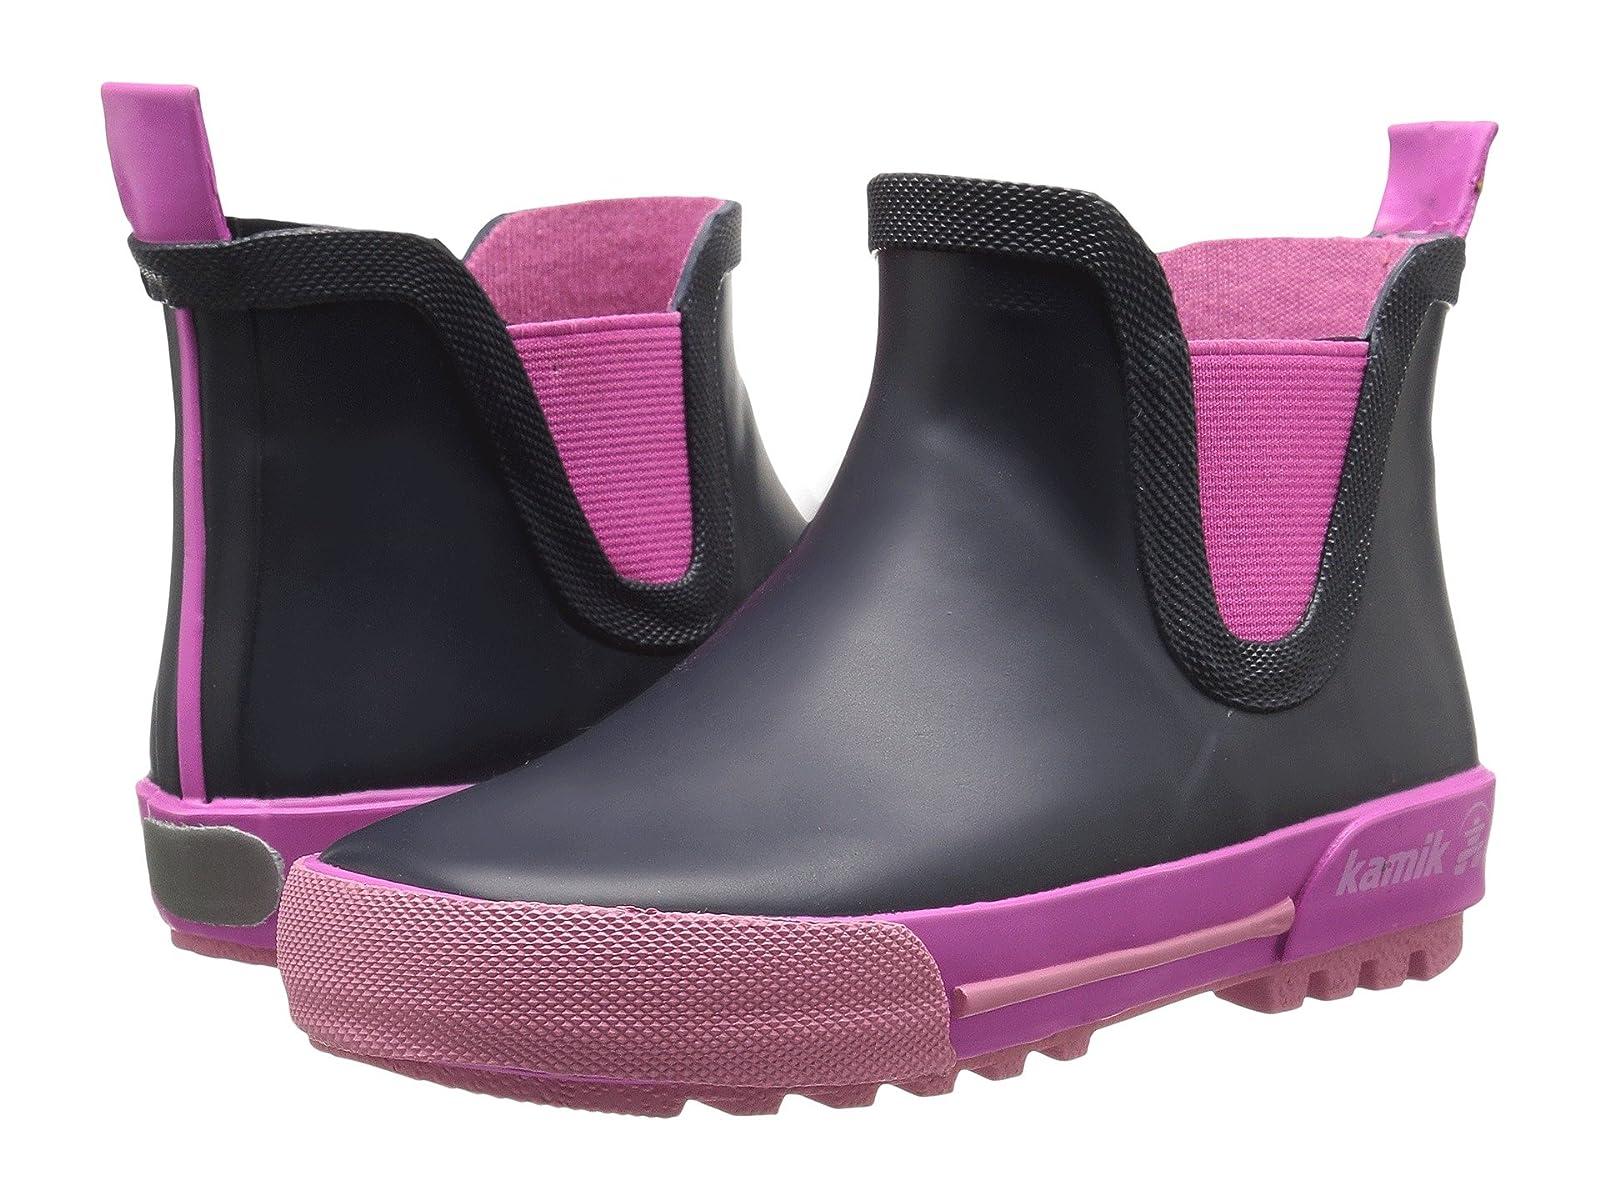 Kamik Kids Rainplaylo (Toddler)Affordable and distinctive shoes